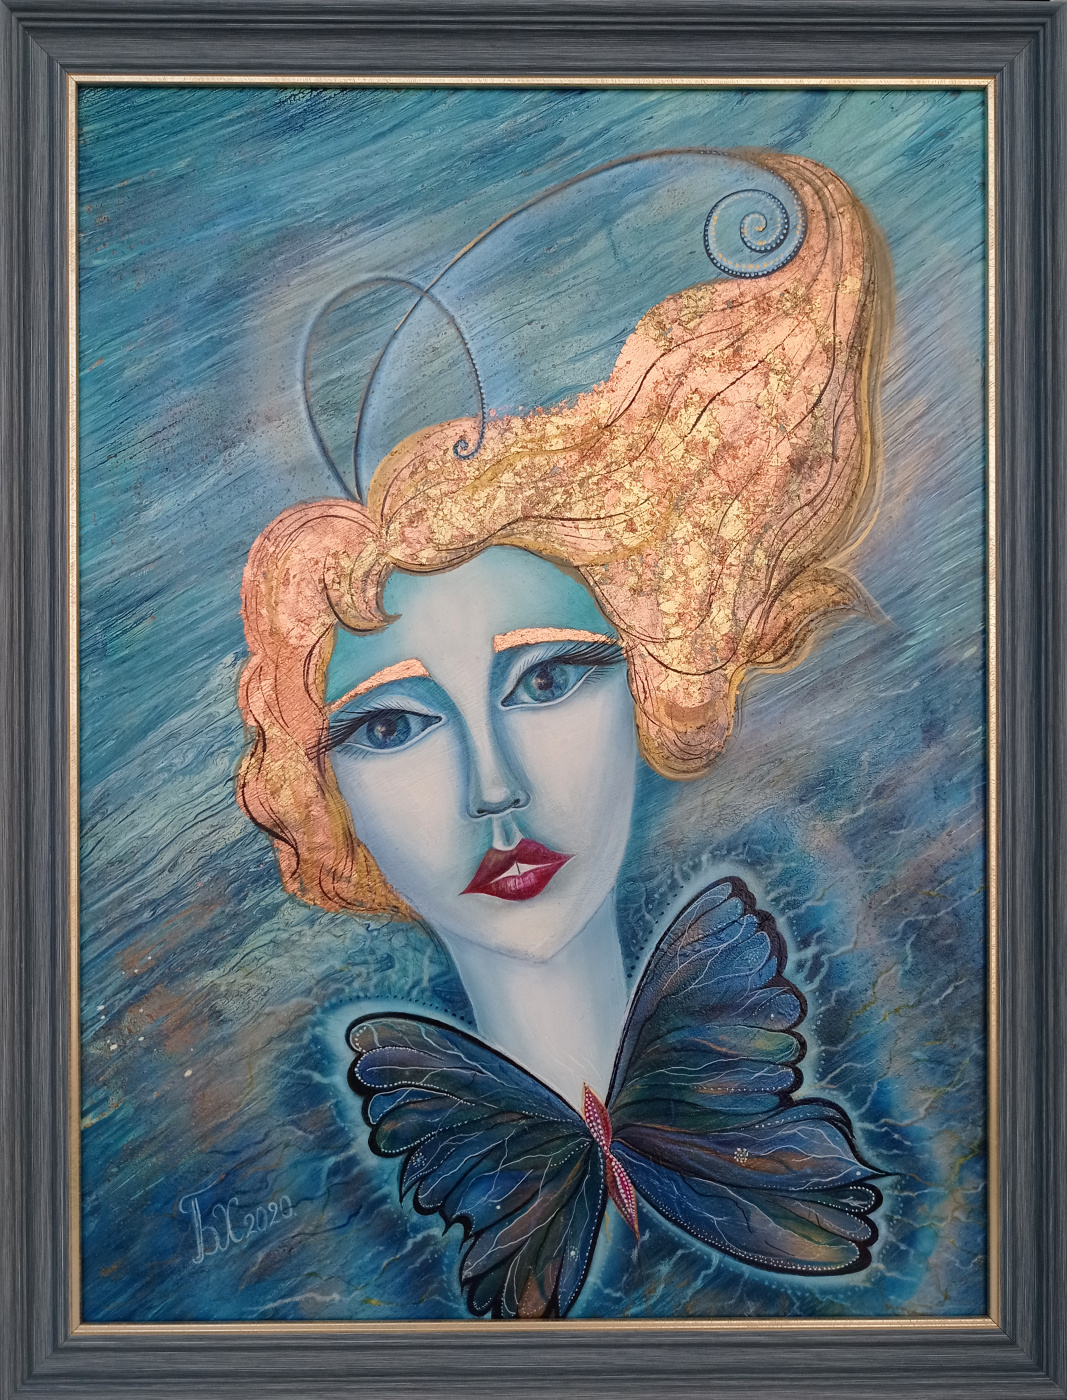 Khristina Igorevna Belousova. Butterfly from the abyss.